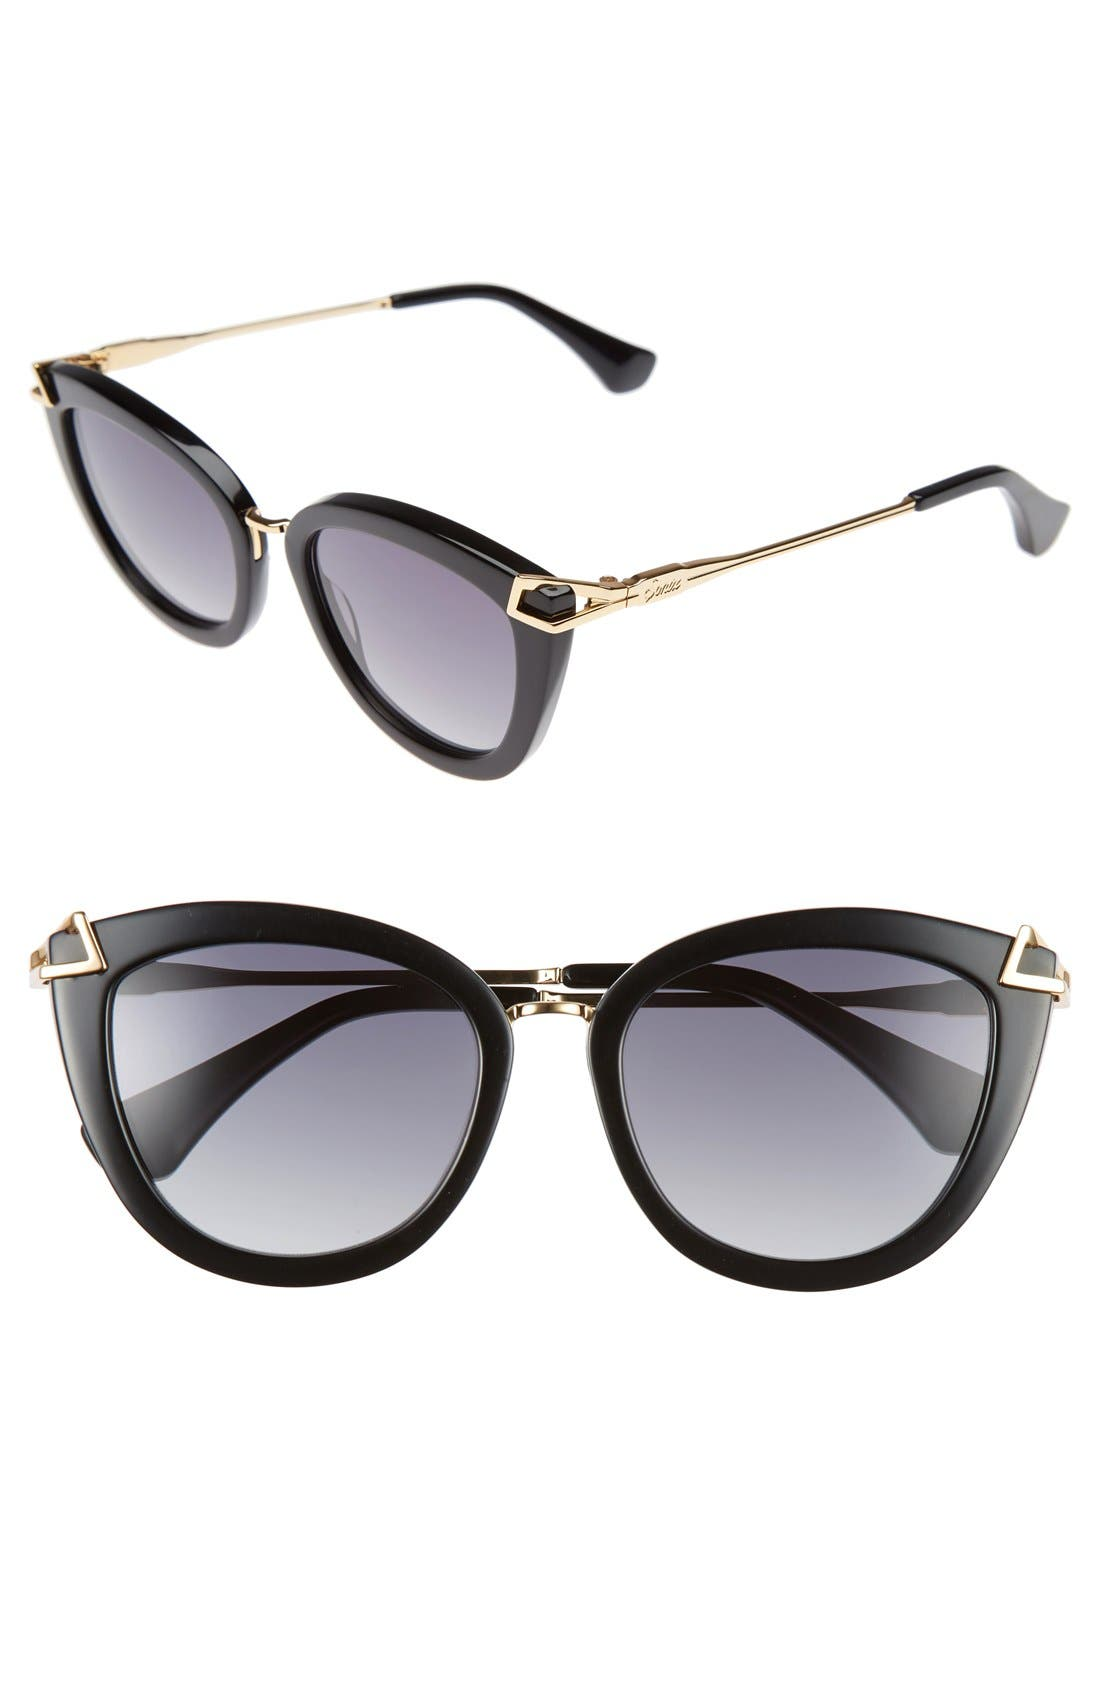 Main Image - Sonix Melrose 51mm Gradient Cat Eye Sunglasses